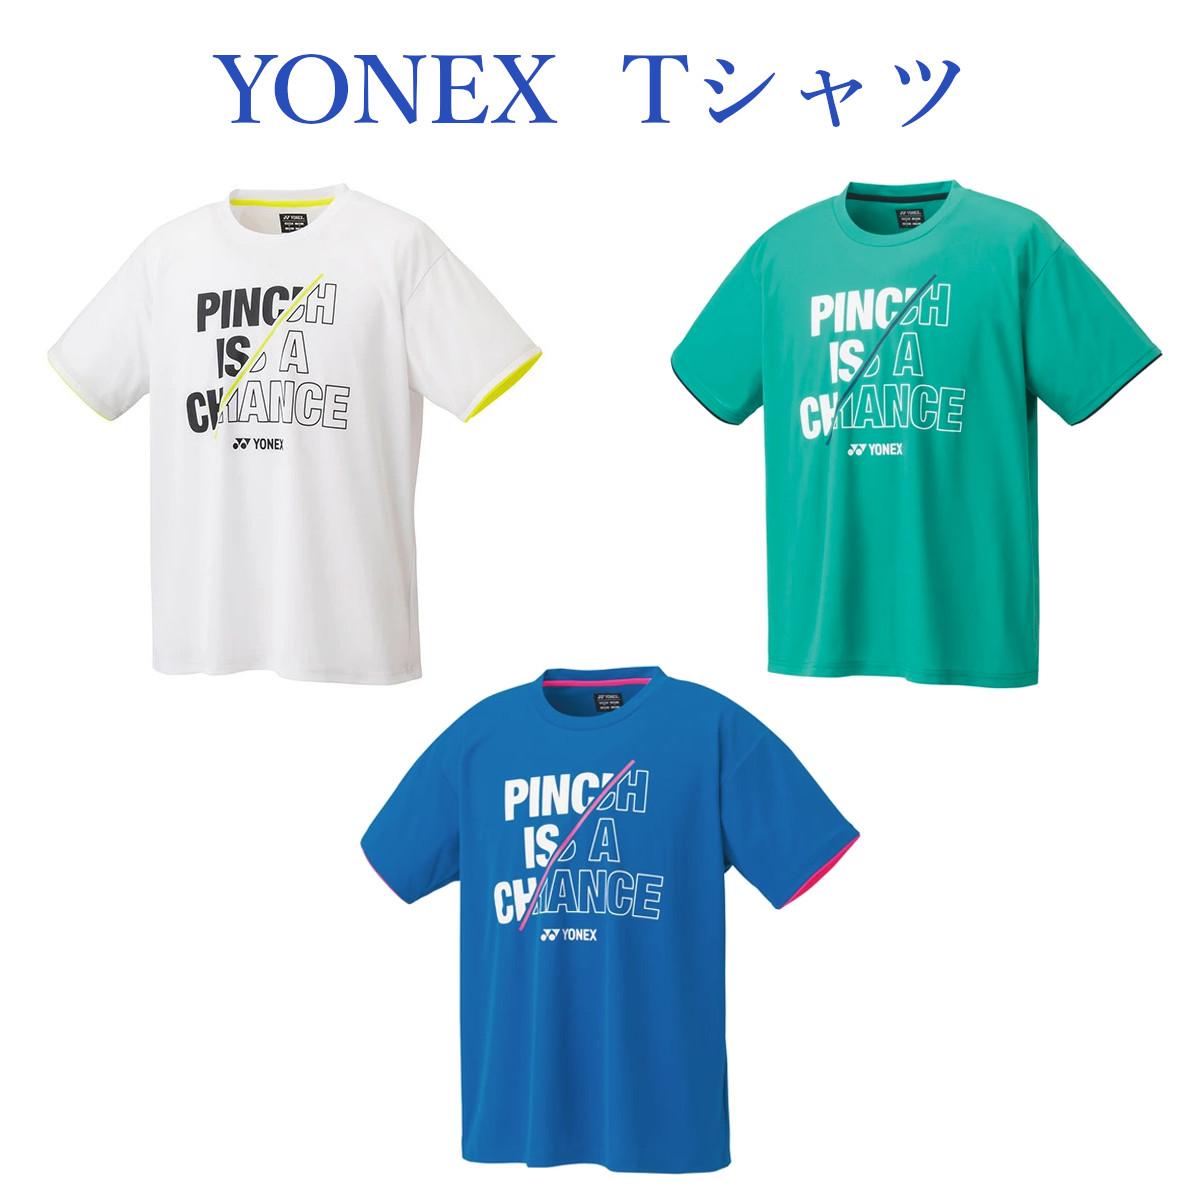 YONEX 受注会限定 子供用 半袖 ヨネックス ドライTシャツ 16535JY ジュニア ショップ 対応 2021AW メール便 ソフトテニス 奉呈 バドミントン テニス ゆうパケット